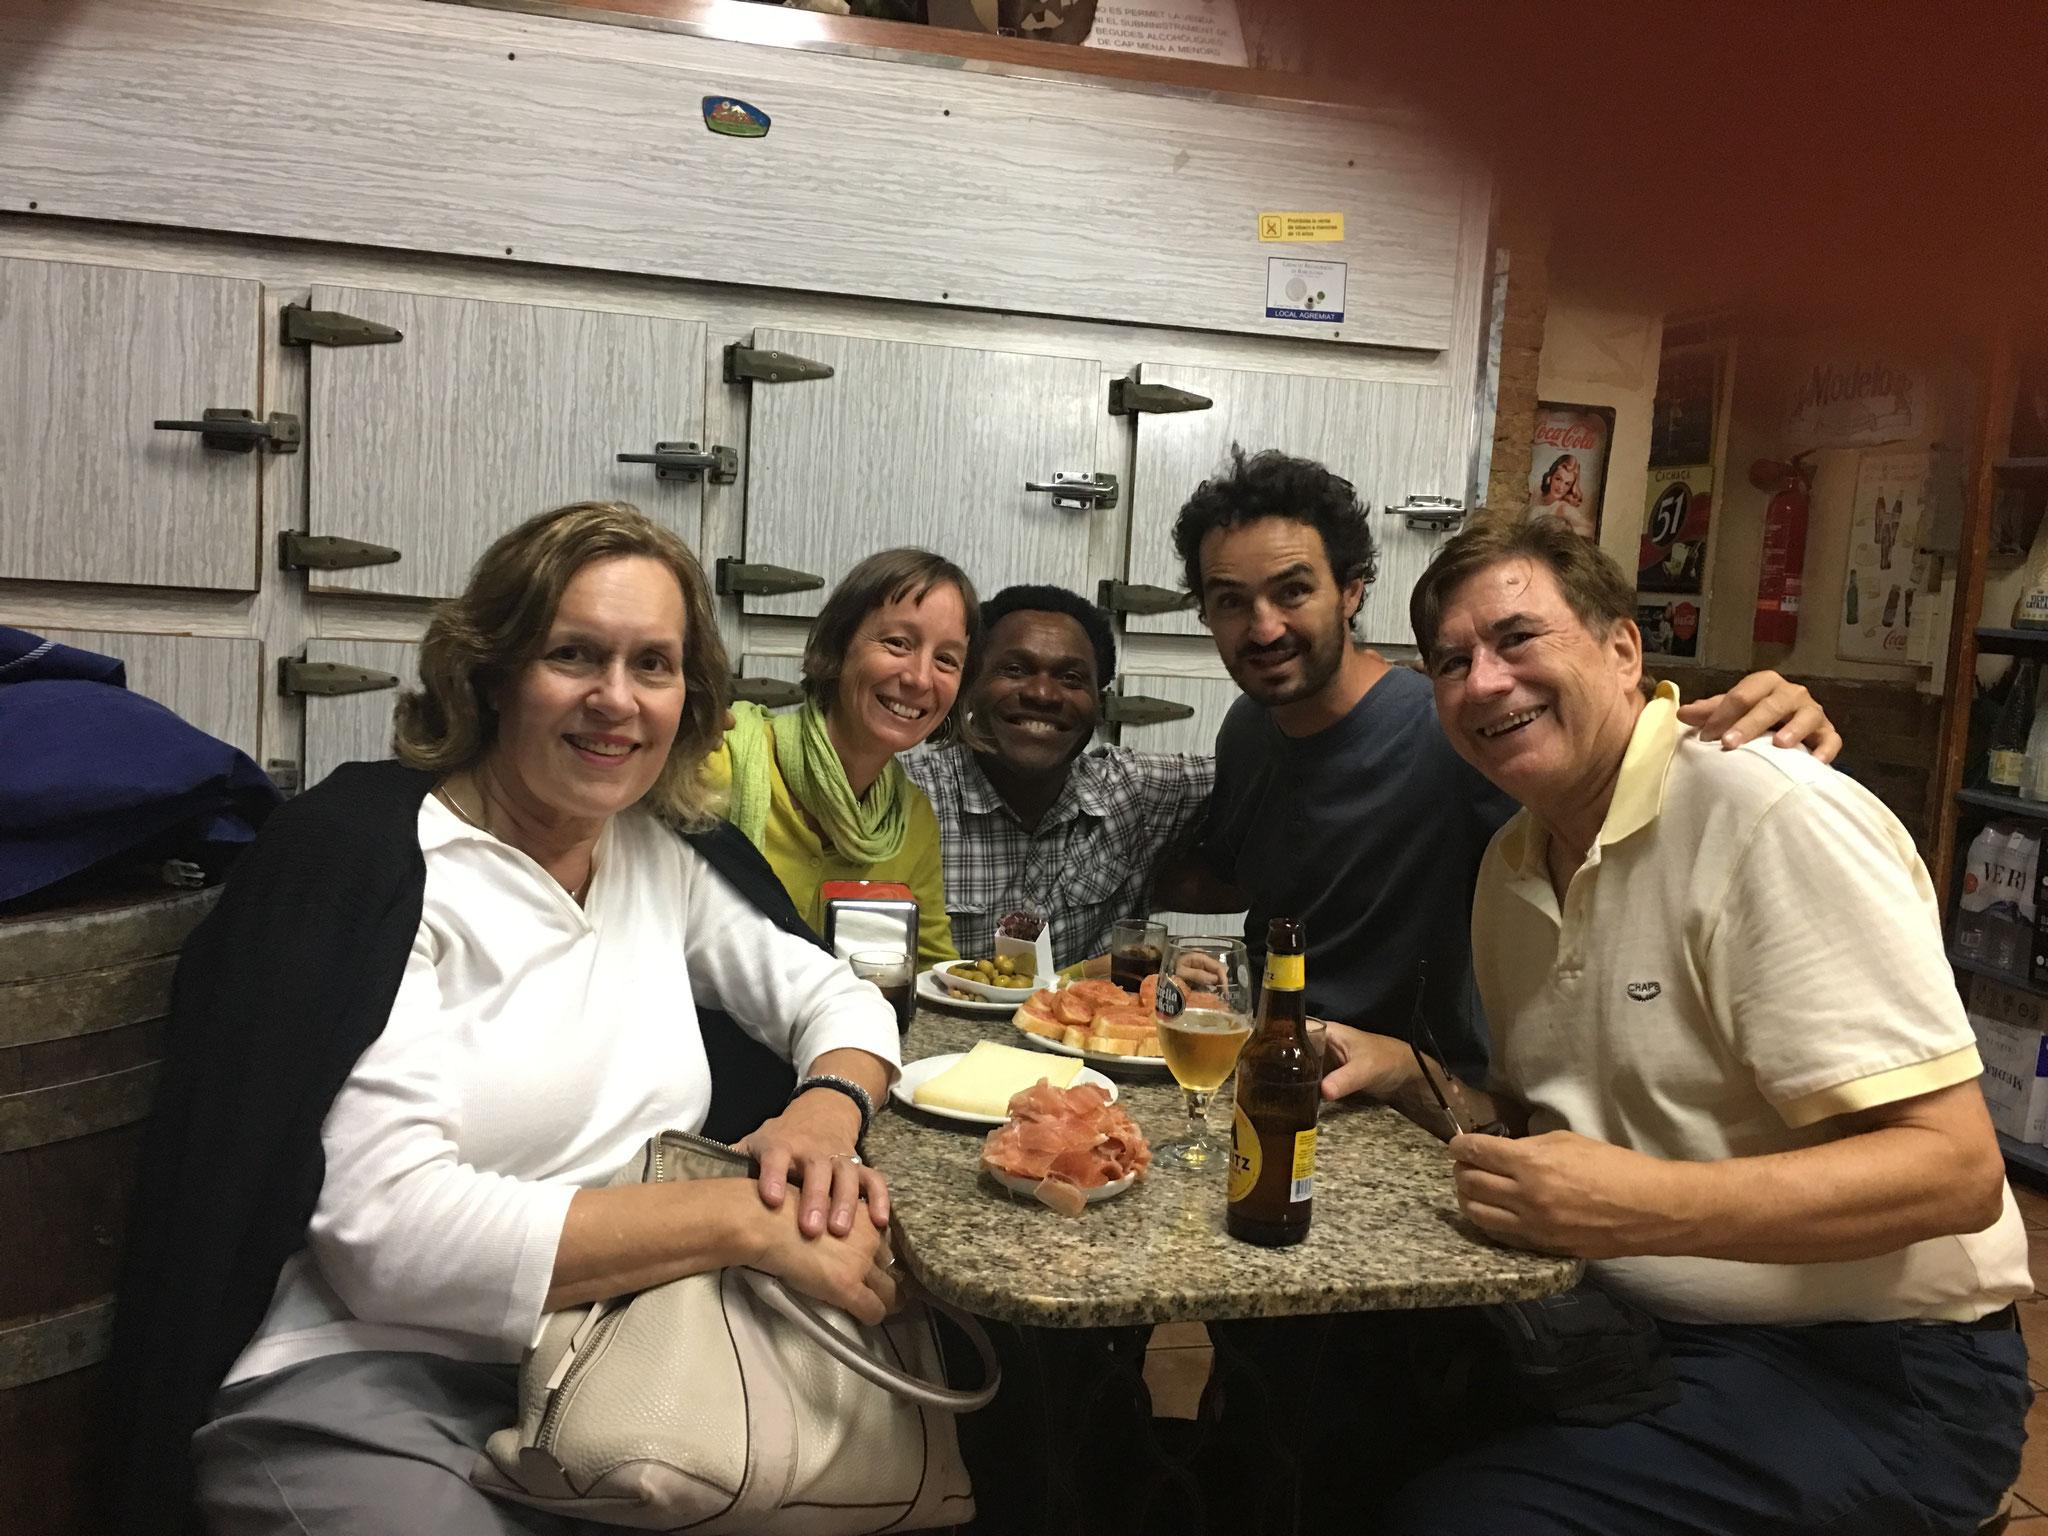 Lorraine, Ana, bar owner, Juanma, & John, old town, Barcelona